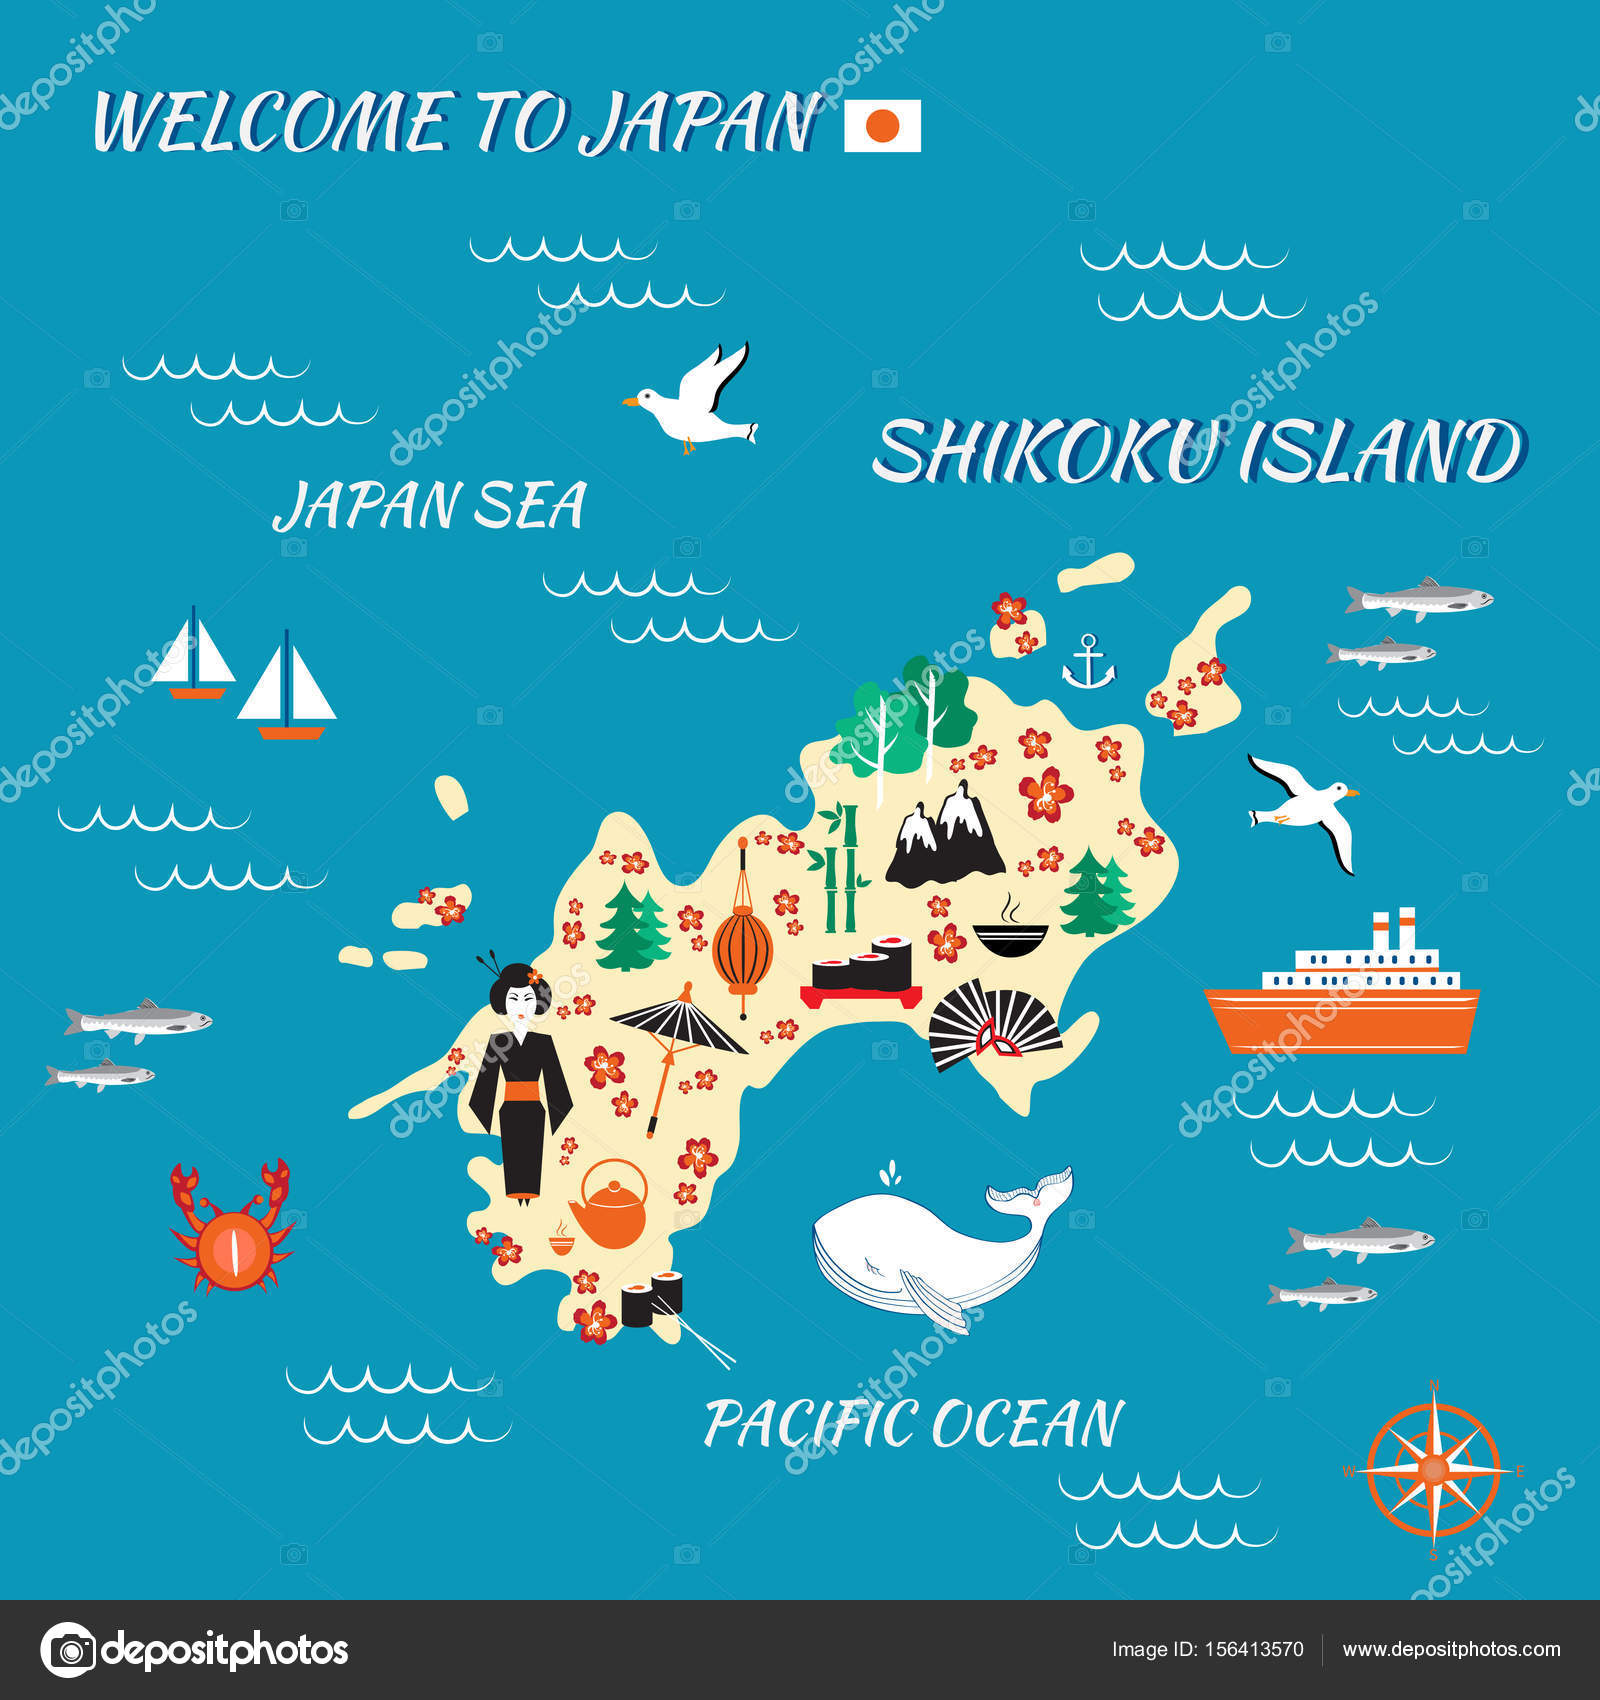 Japan Cartoon Travel Map Vector Illustration Shikoku Island - Japan map cartoon